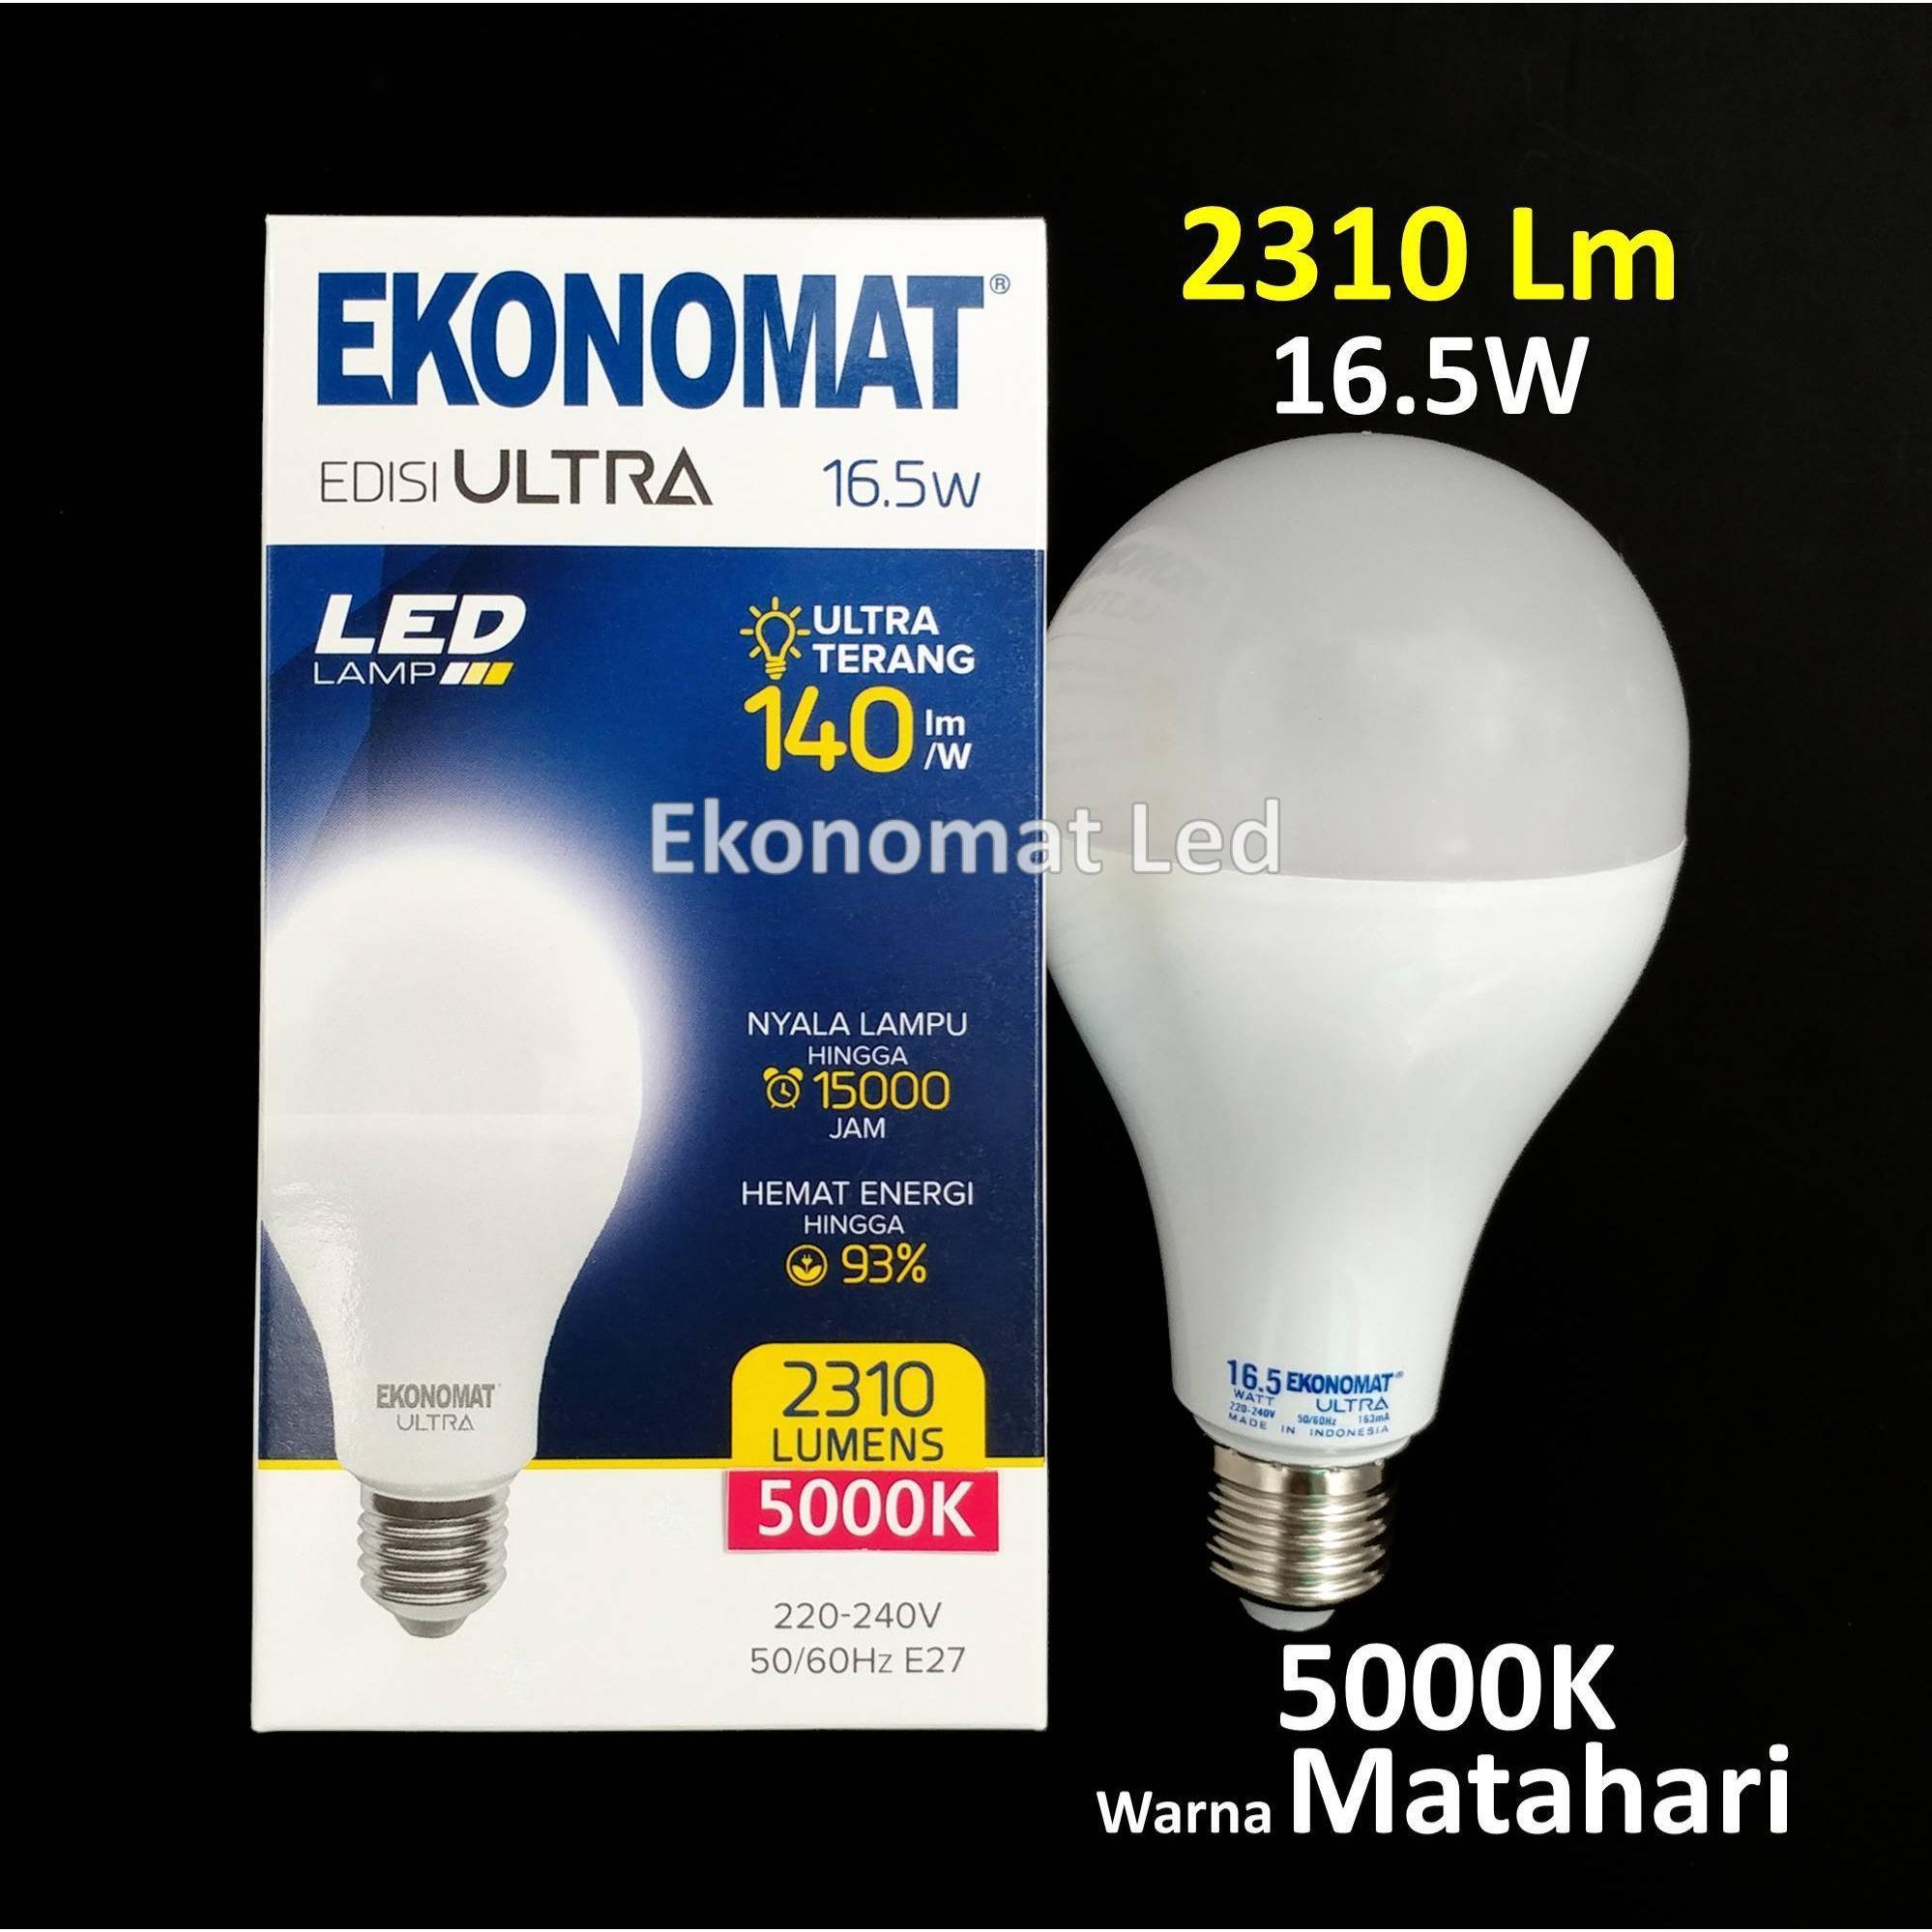 Lampu LED Bohlam Ekonomat ULTRA 2310 Lm 16,5W 5000K Warna Matahari 16,5 Watt [Matahari]